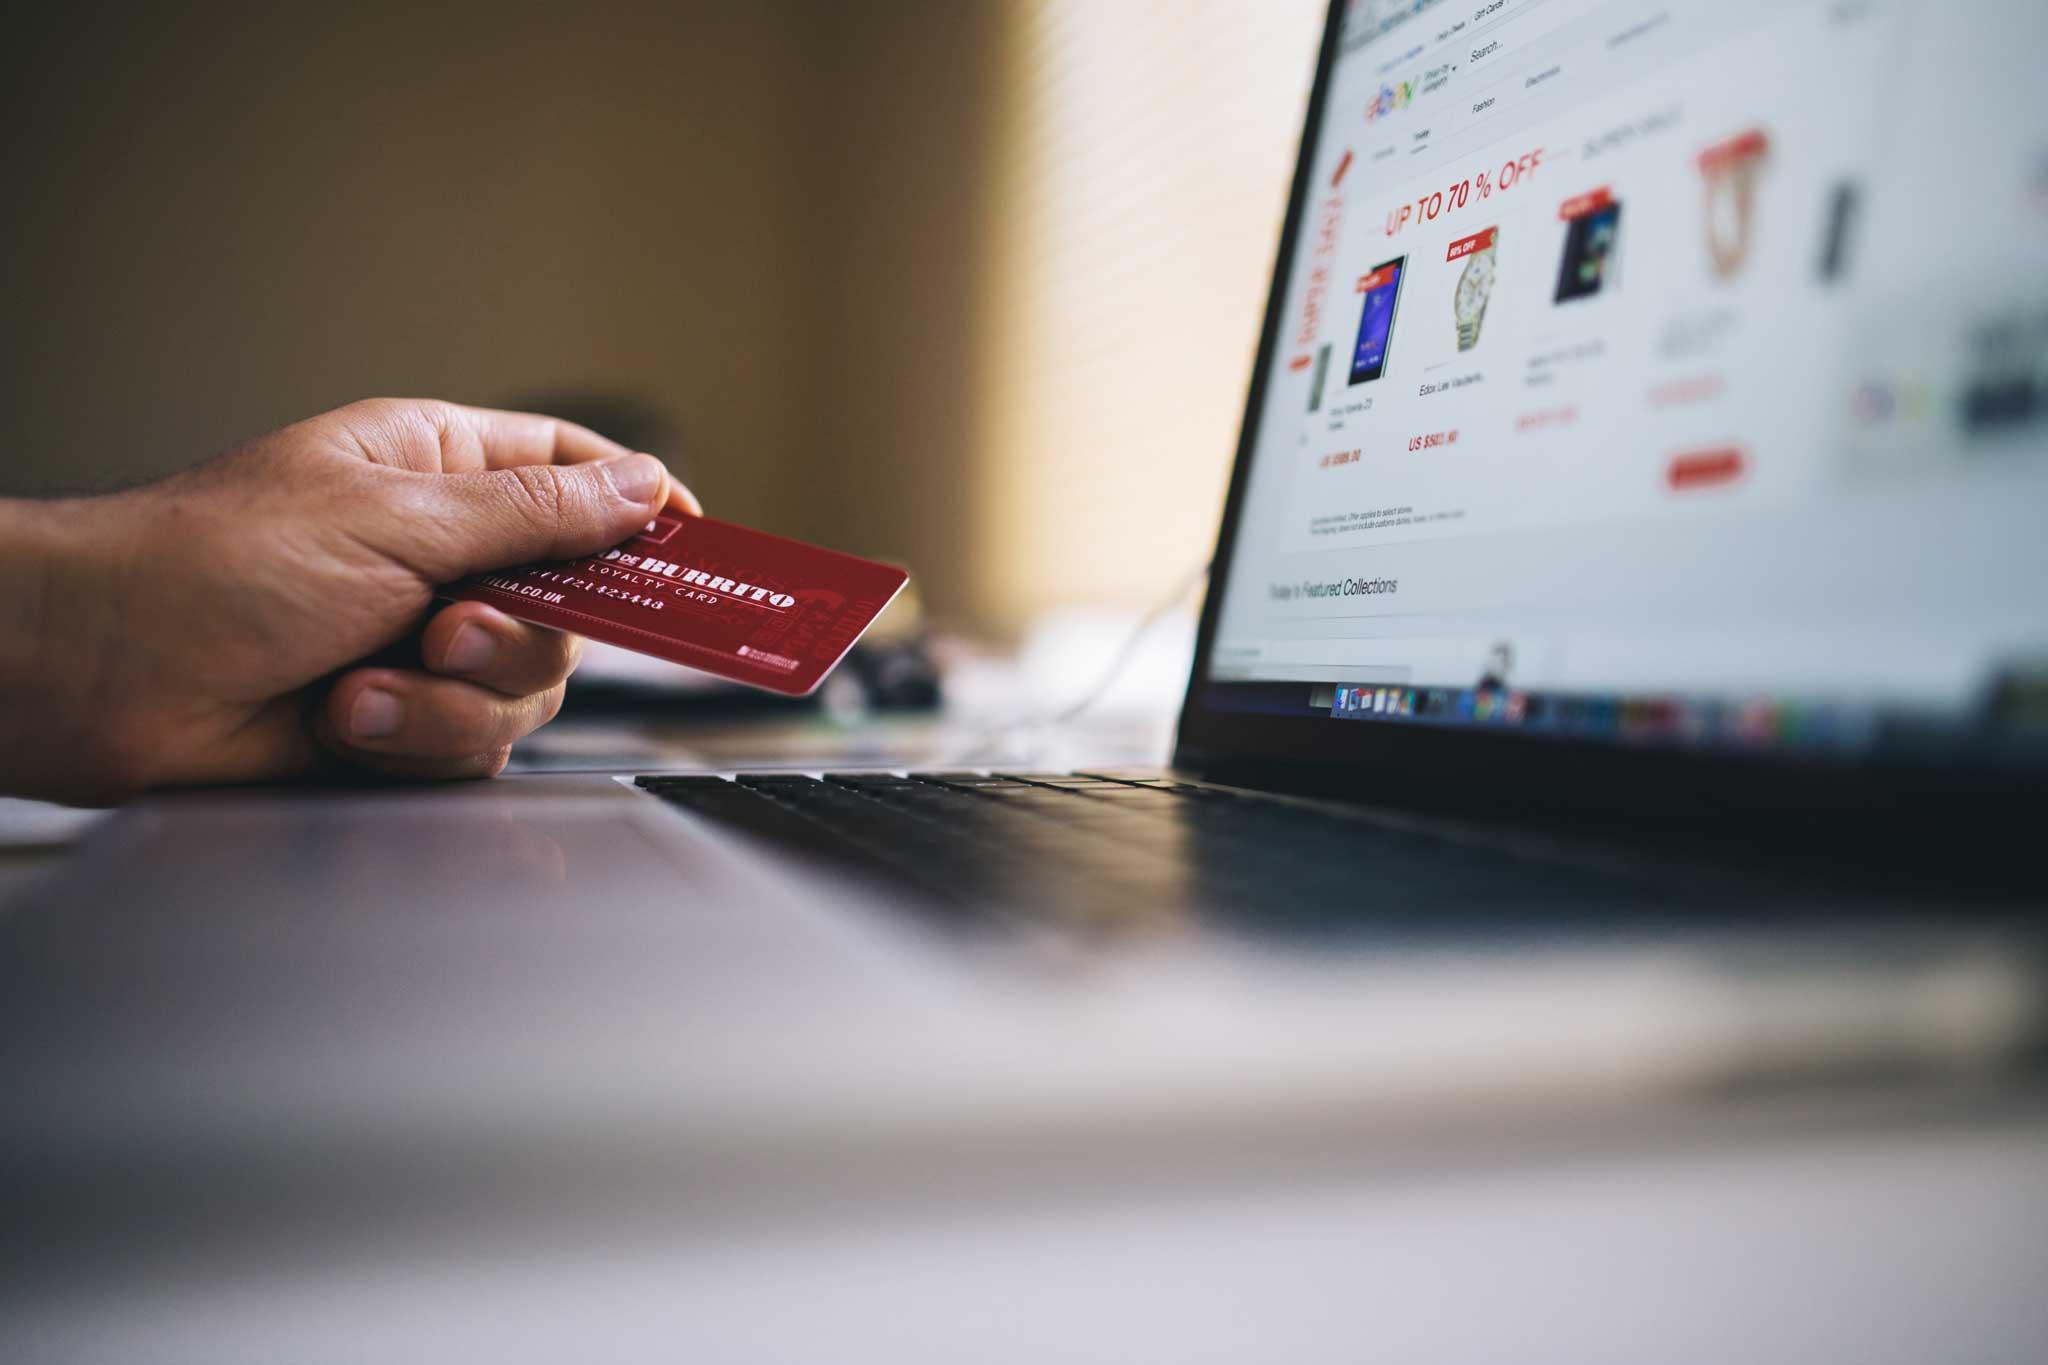 Online-Shop-eCommerce-Website-Designing-and-Development